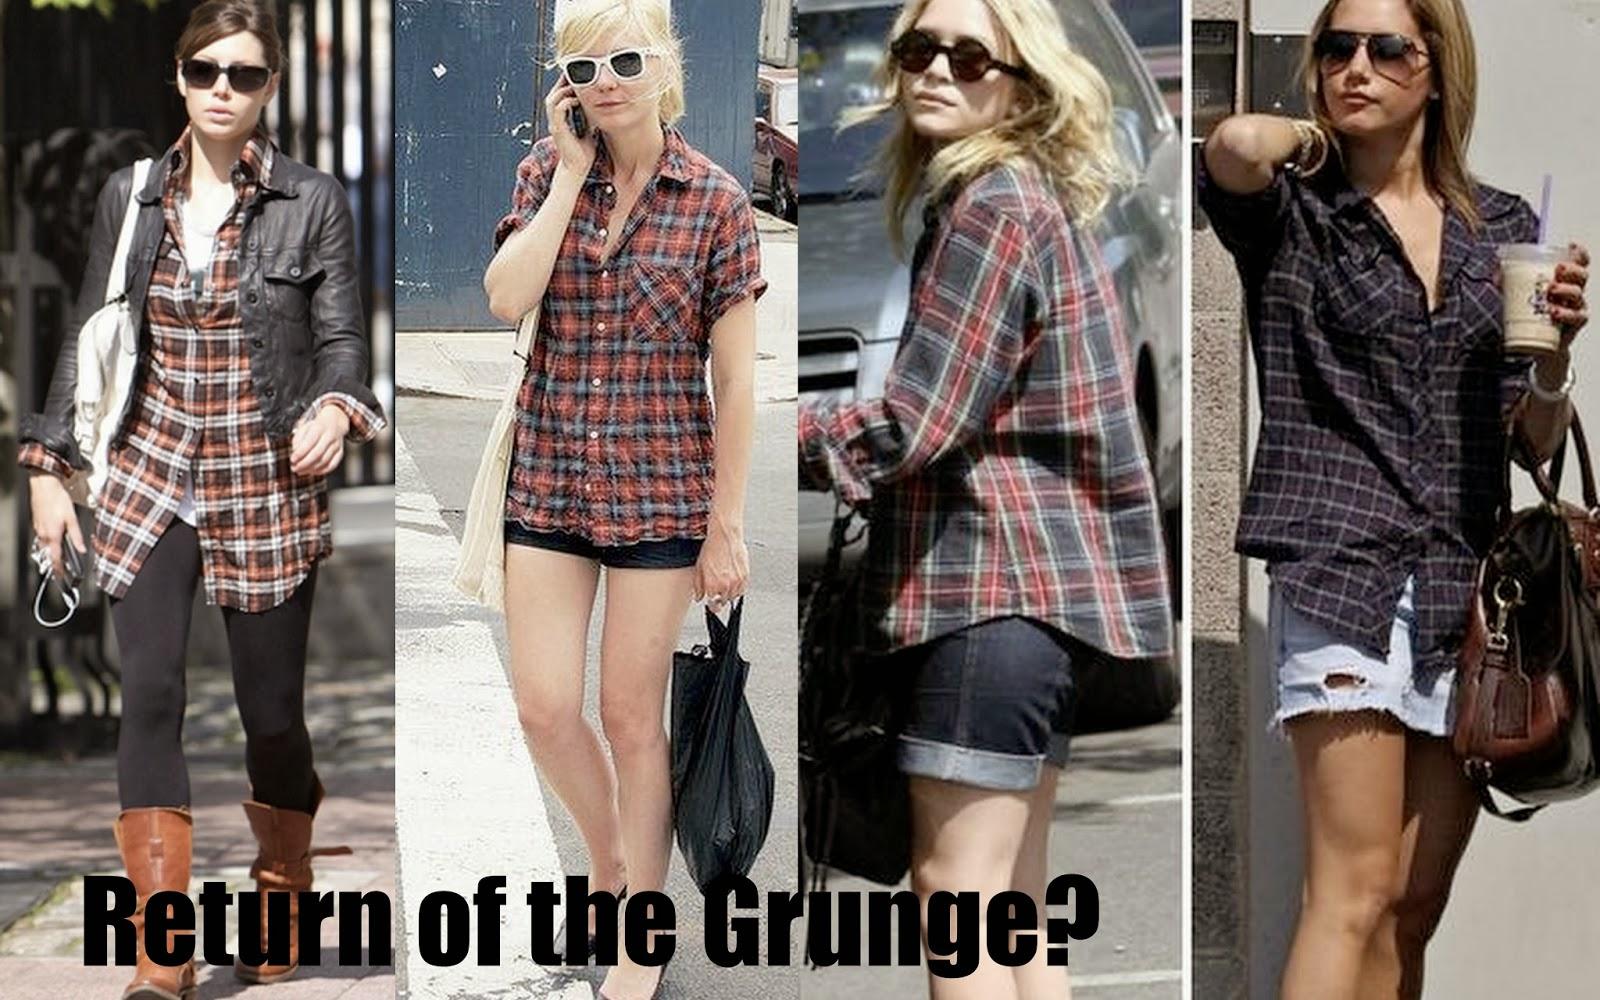 Grunge fashion 1990s men 1990s grunge fashion related keywords - Foto Raflarda G Rd N Z Gibi Ortun Kotun Ete In St Ne